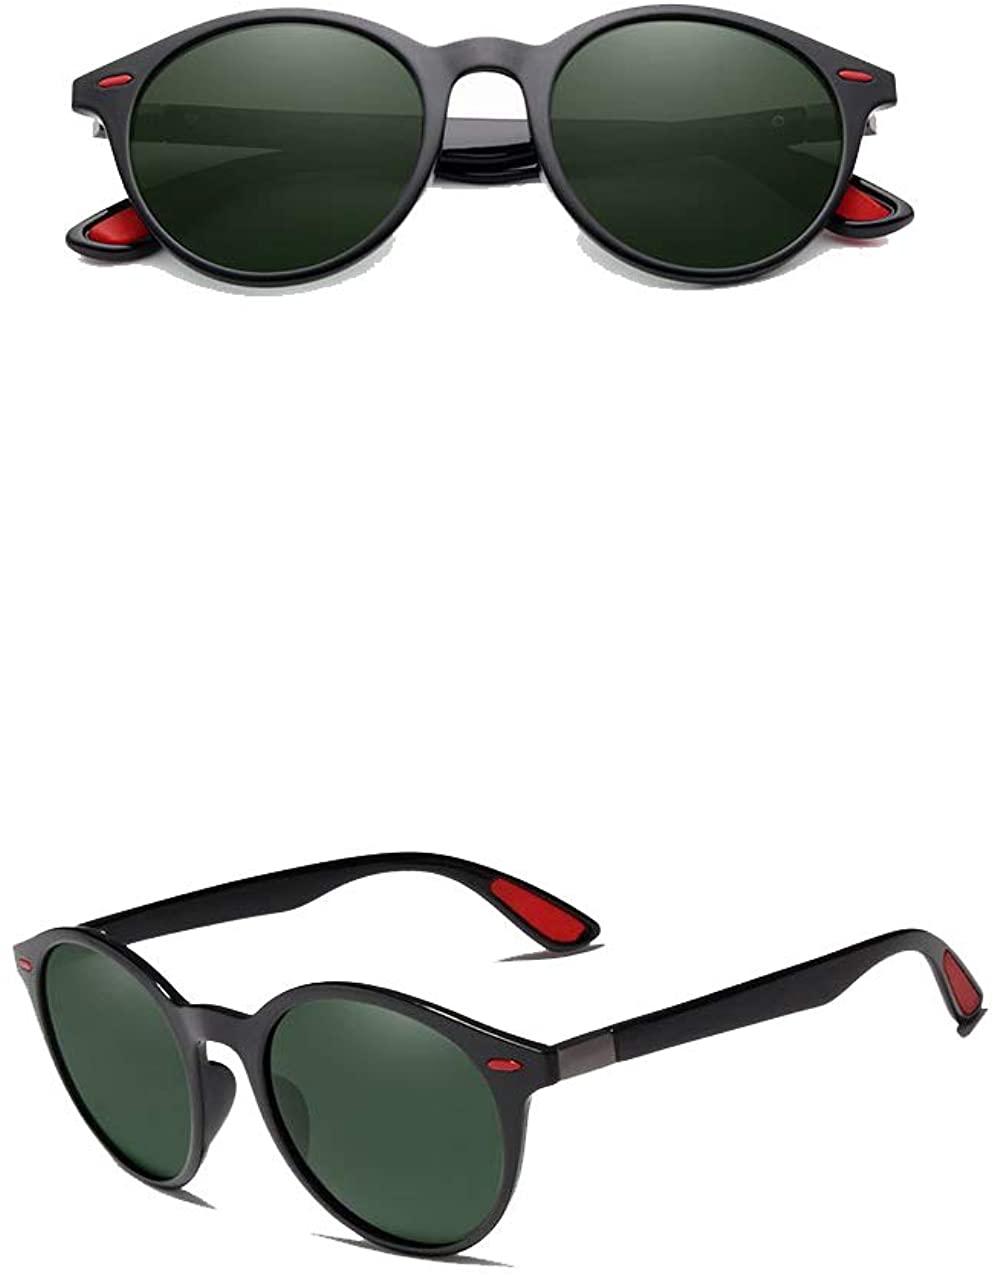 Genuine Kingseven TR90 Tough Polarized Sunglasses For Men and Women Round Fashion